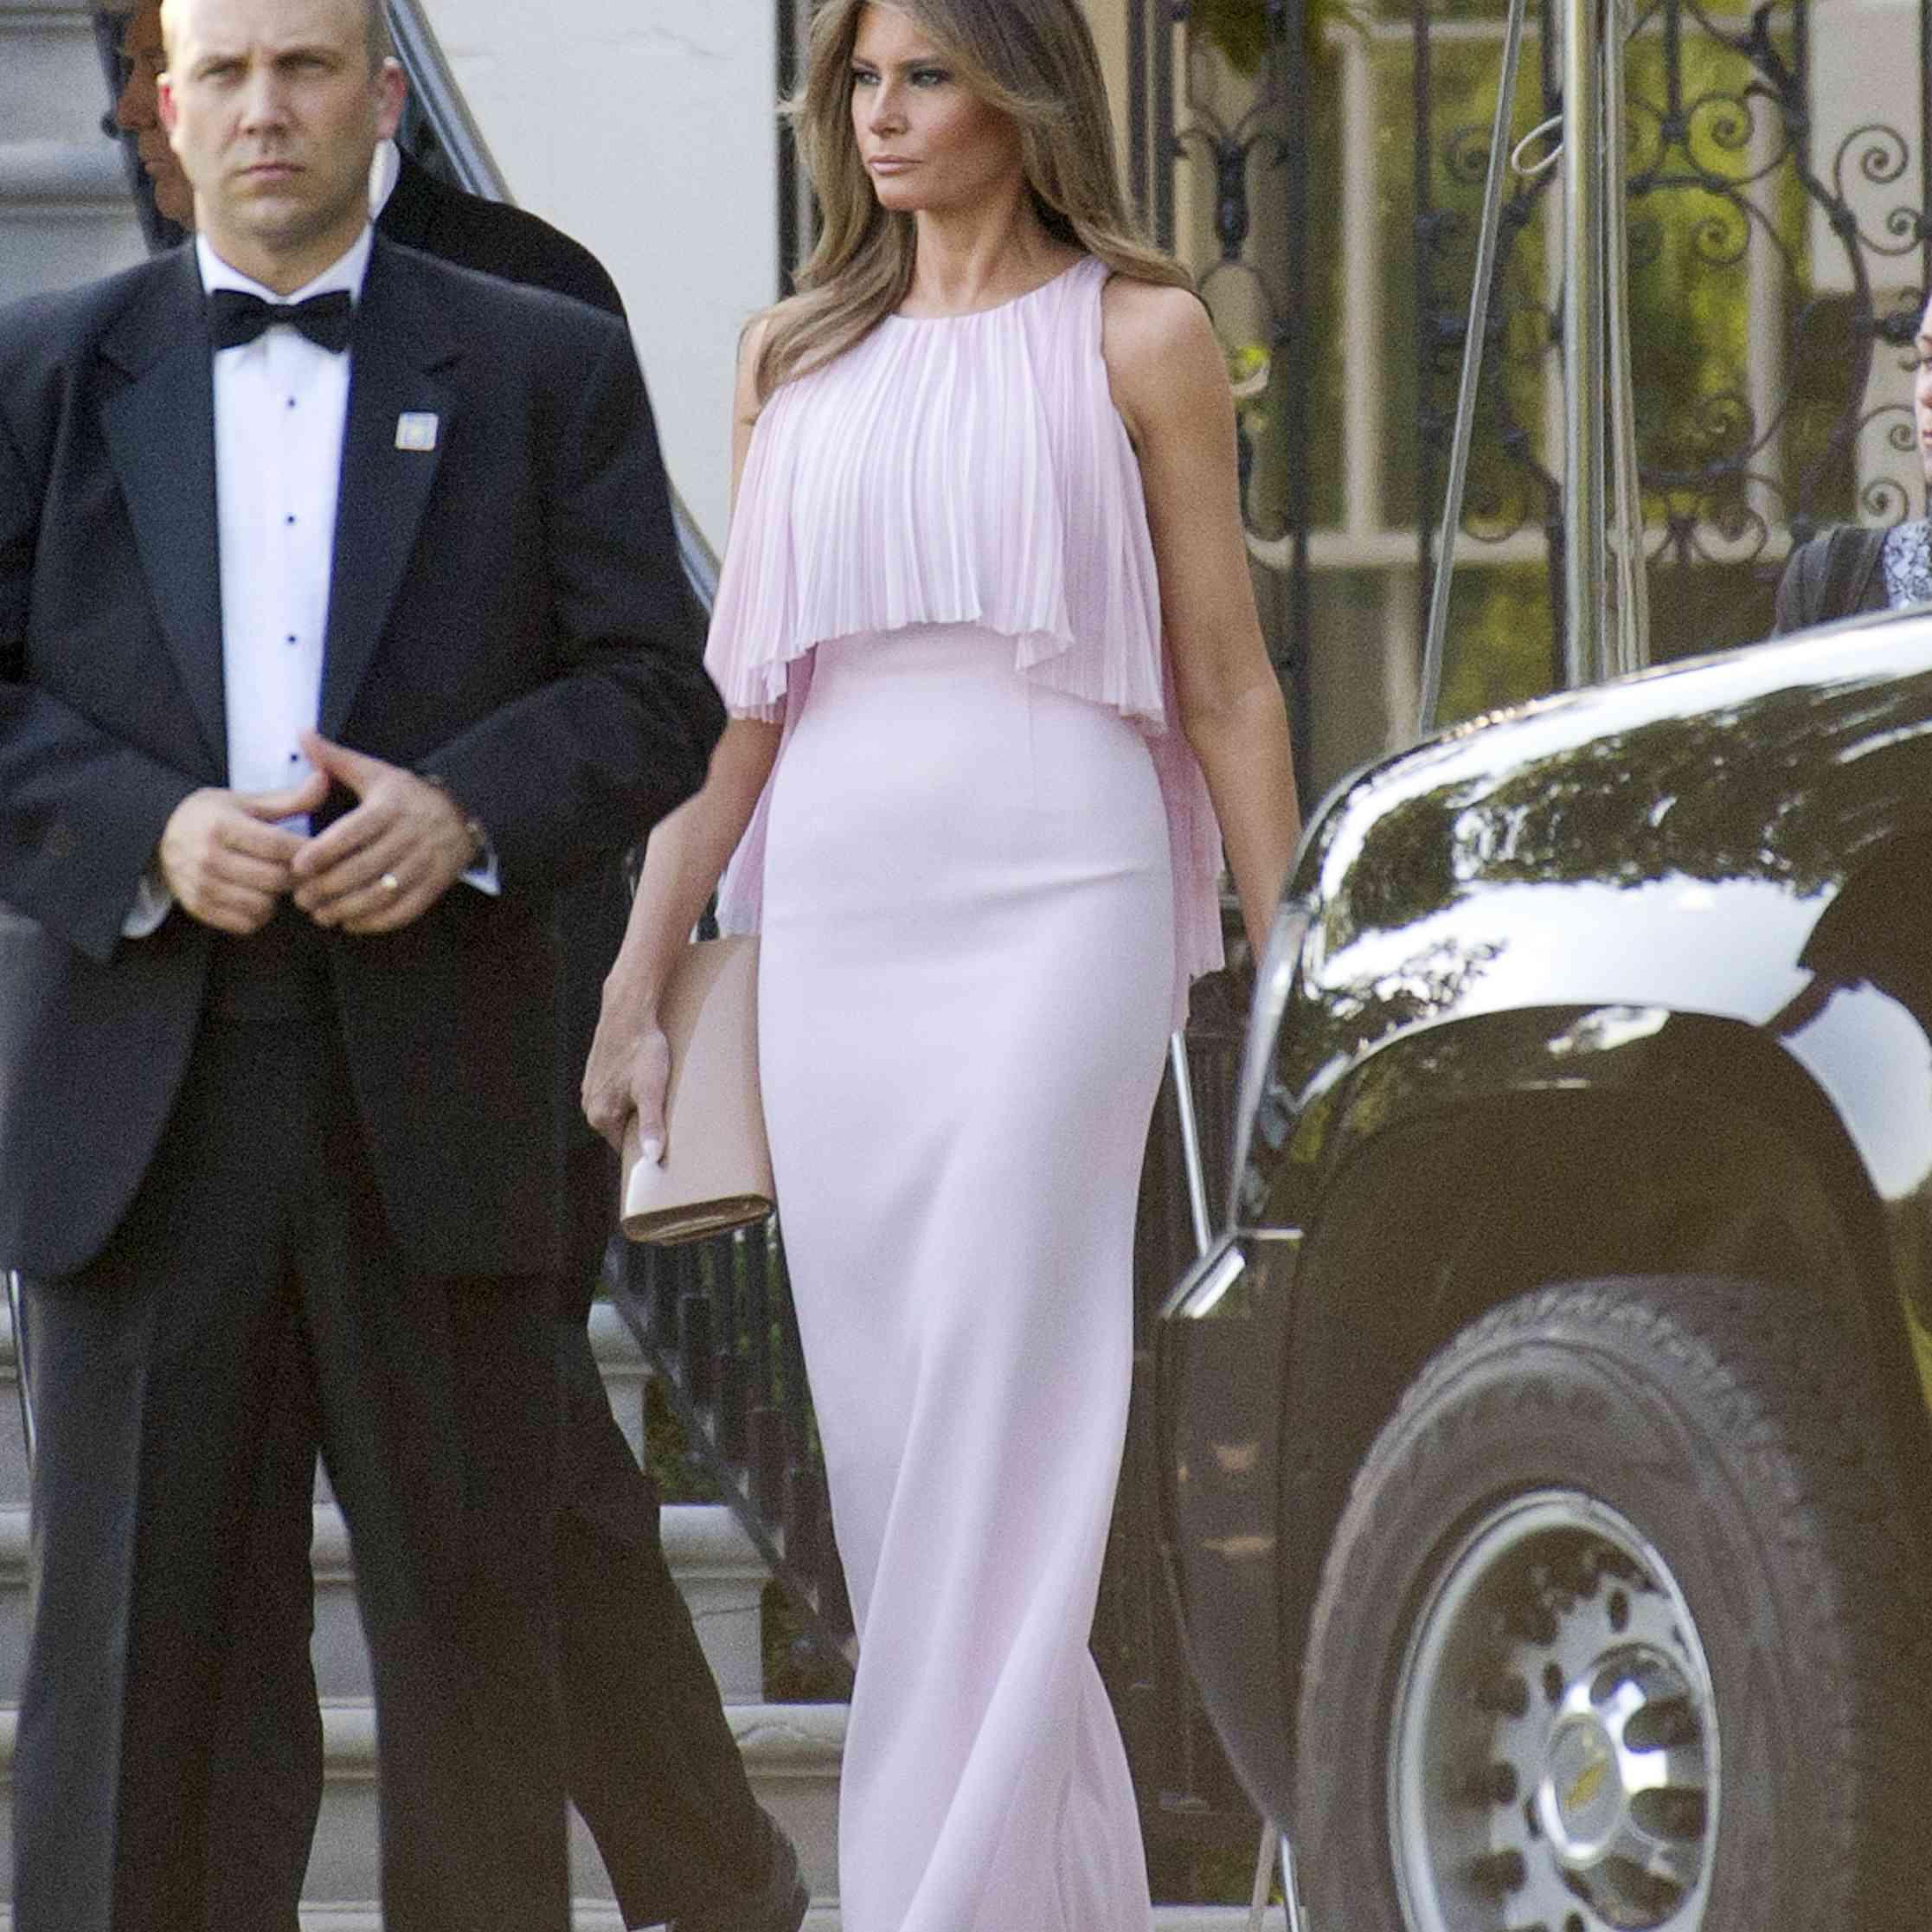 Donald Trump And Melania Wedding: Donald Trump And Melania Attended Treasury Secretary